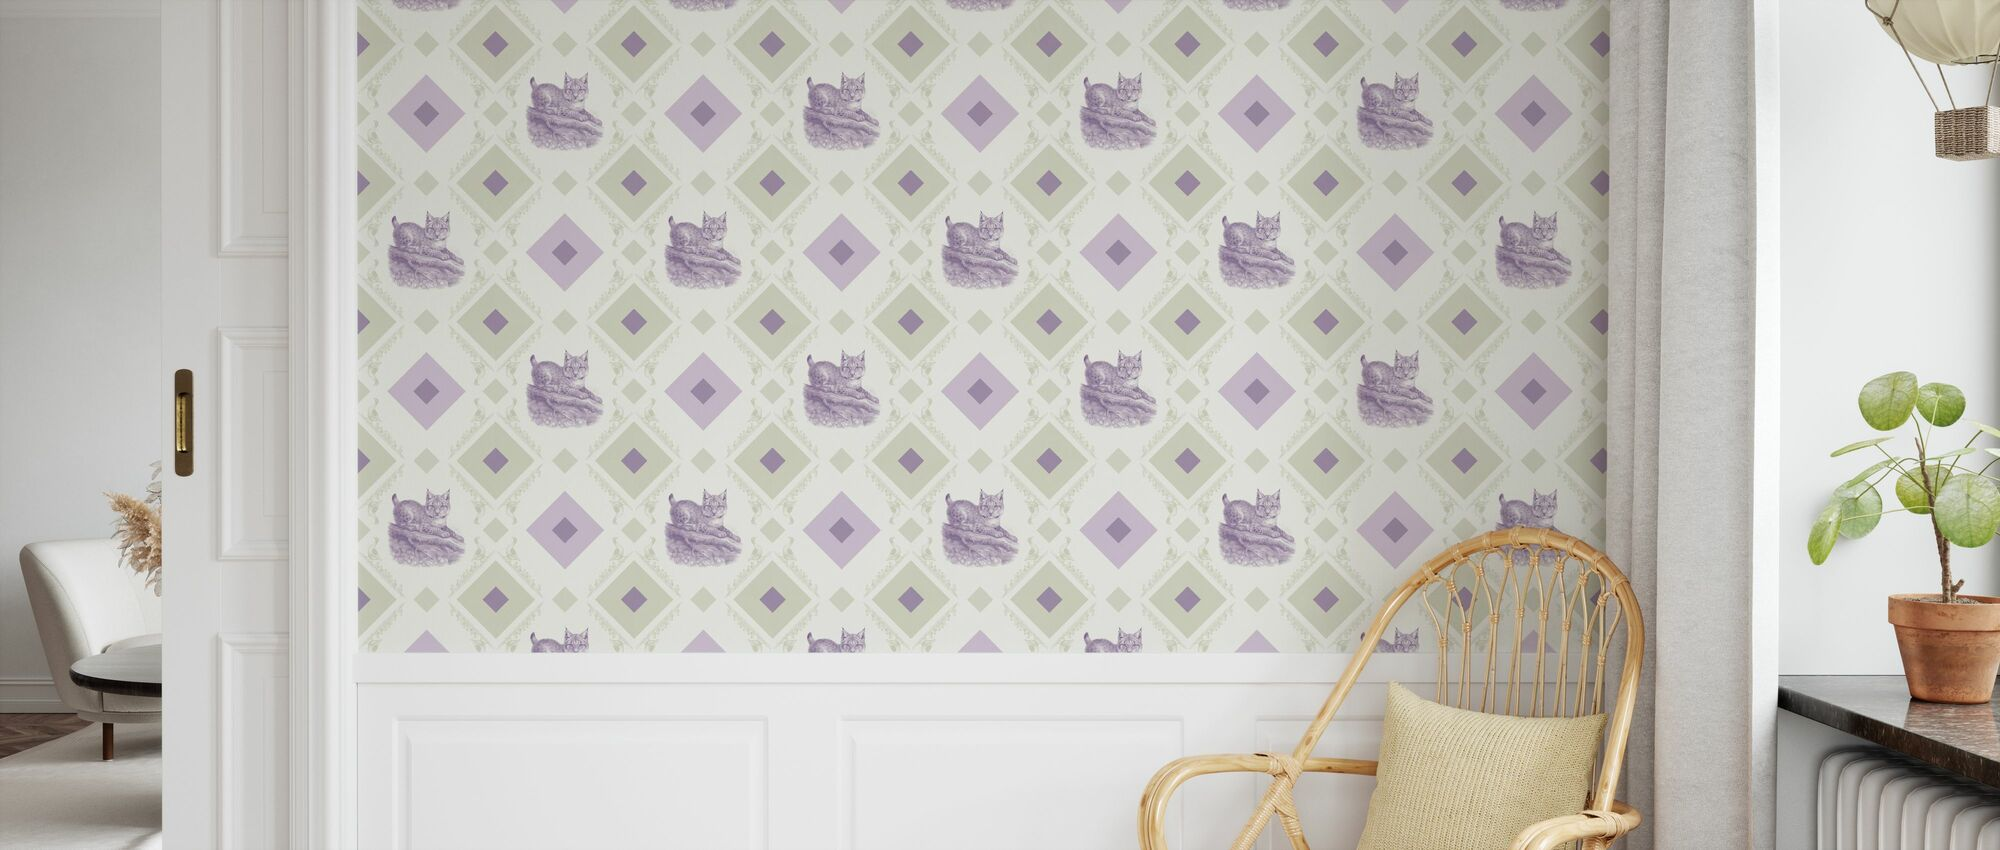 Young Lynx - Gooseframe - Green Purple - Wallpaper - Kids Room